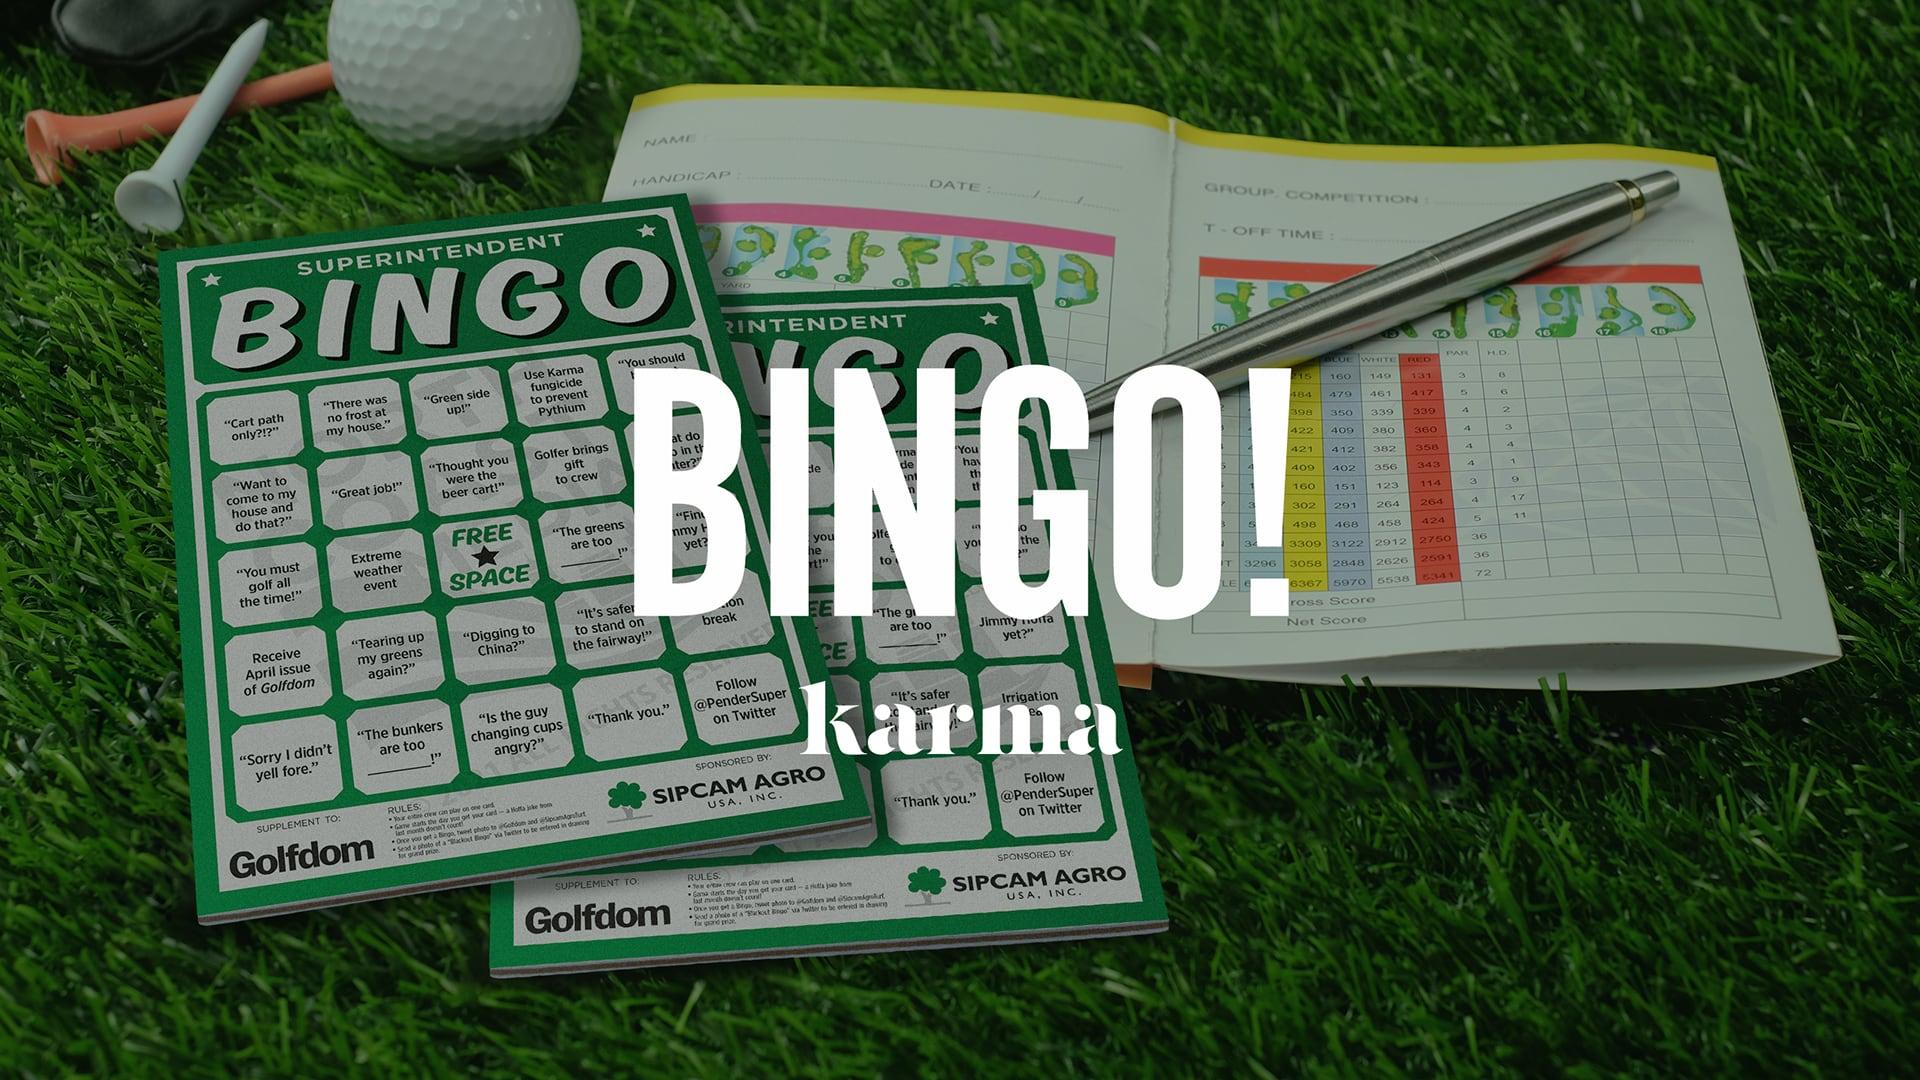 bingo cards laying on turf | Sipcam